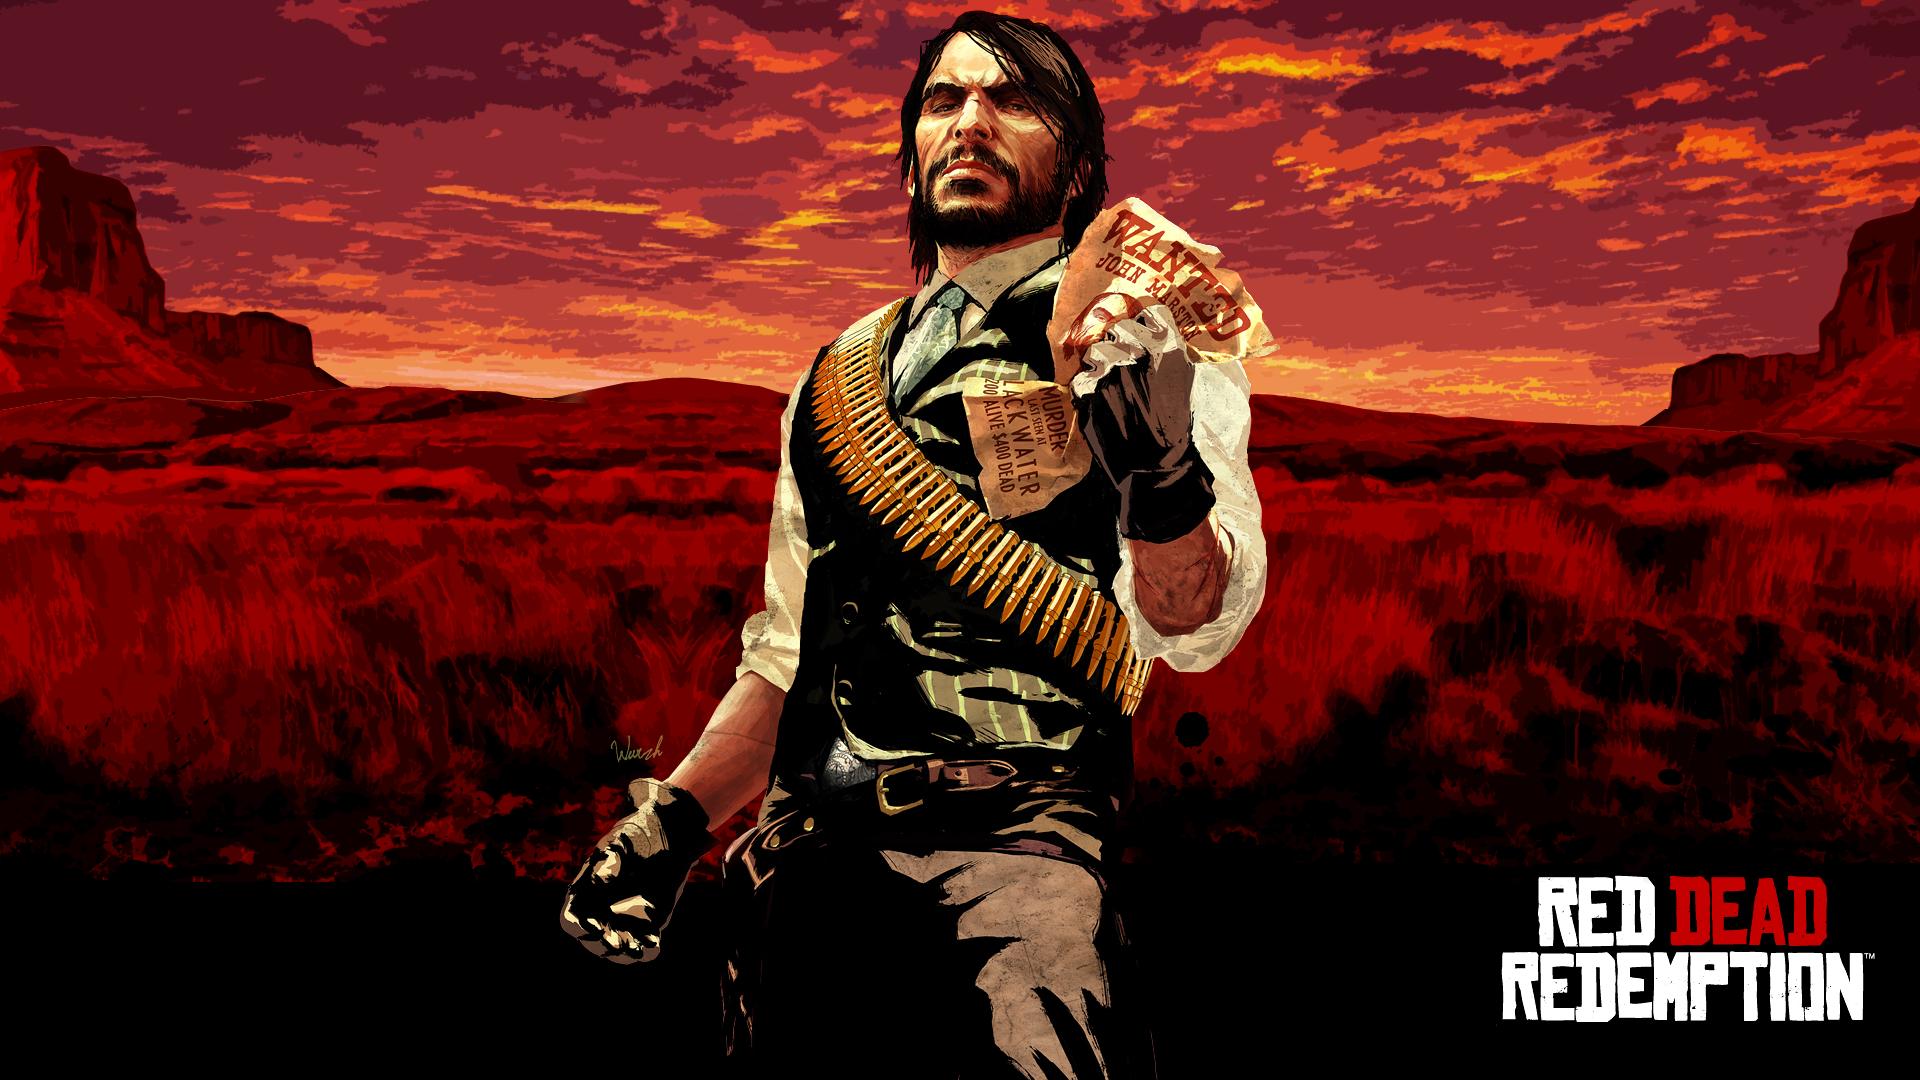 Red Dead Redemption John Marston Wallpaper by thetruemask on ...